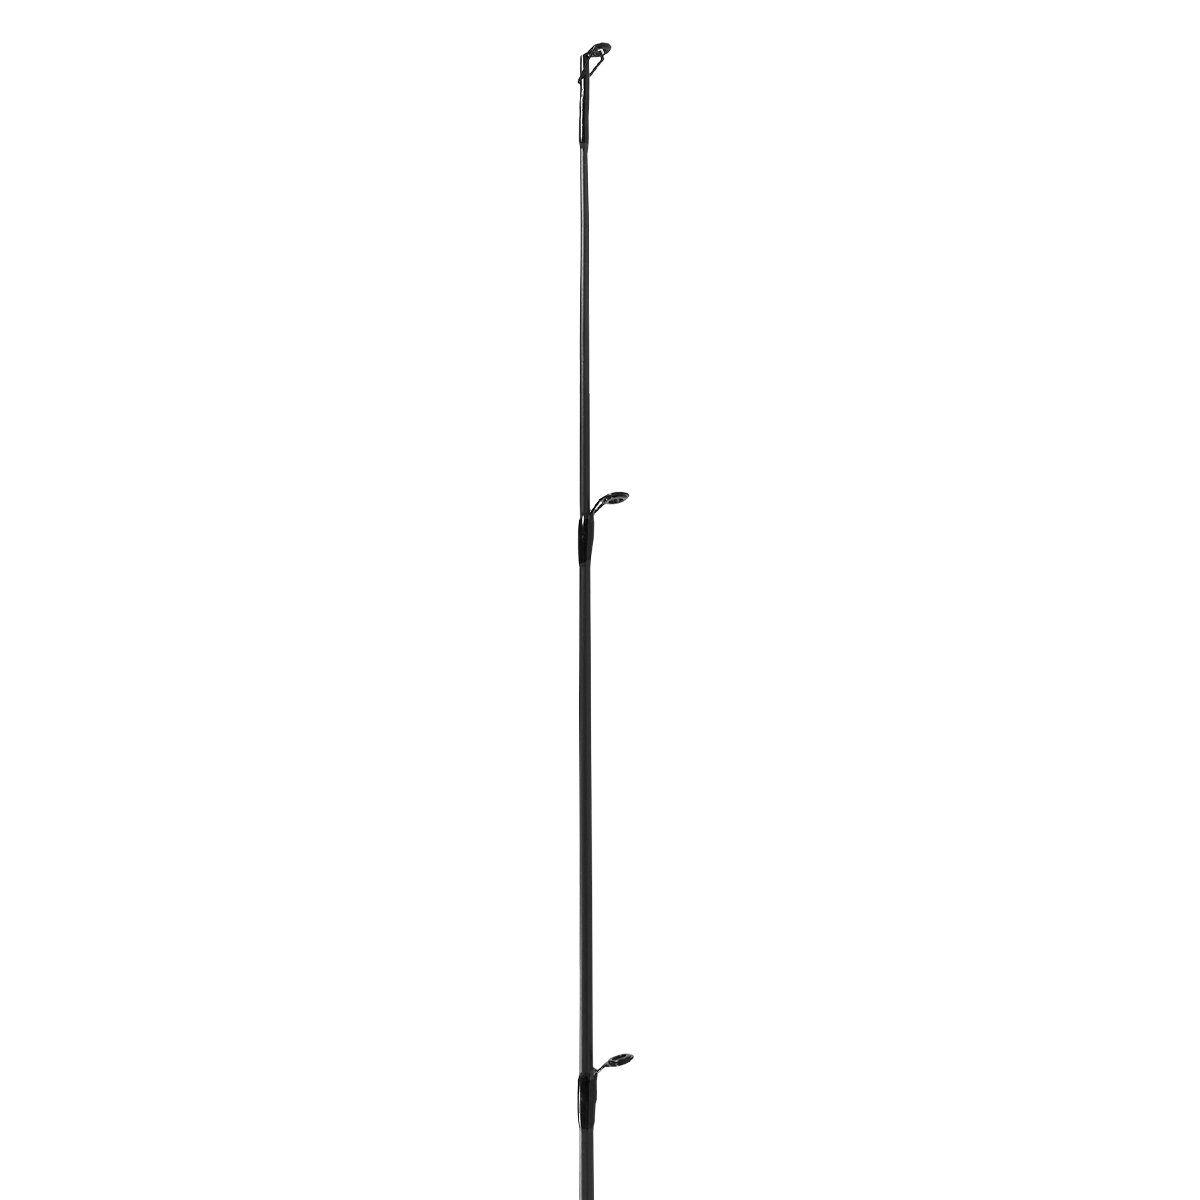 Vara Albatroz Pro Staff Carretilha 1,68m 5'6'' Média 8-17LB